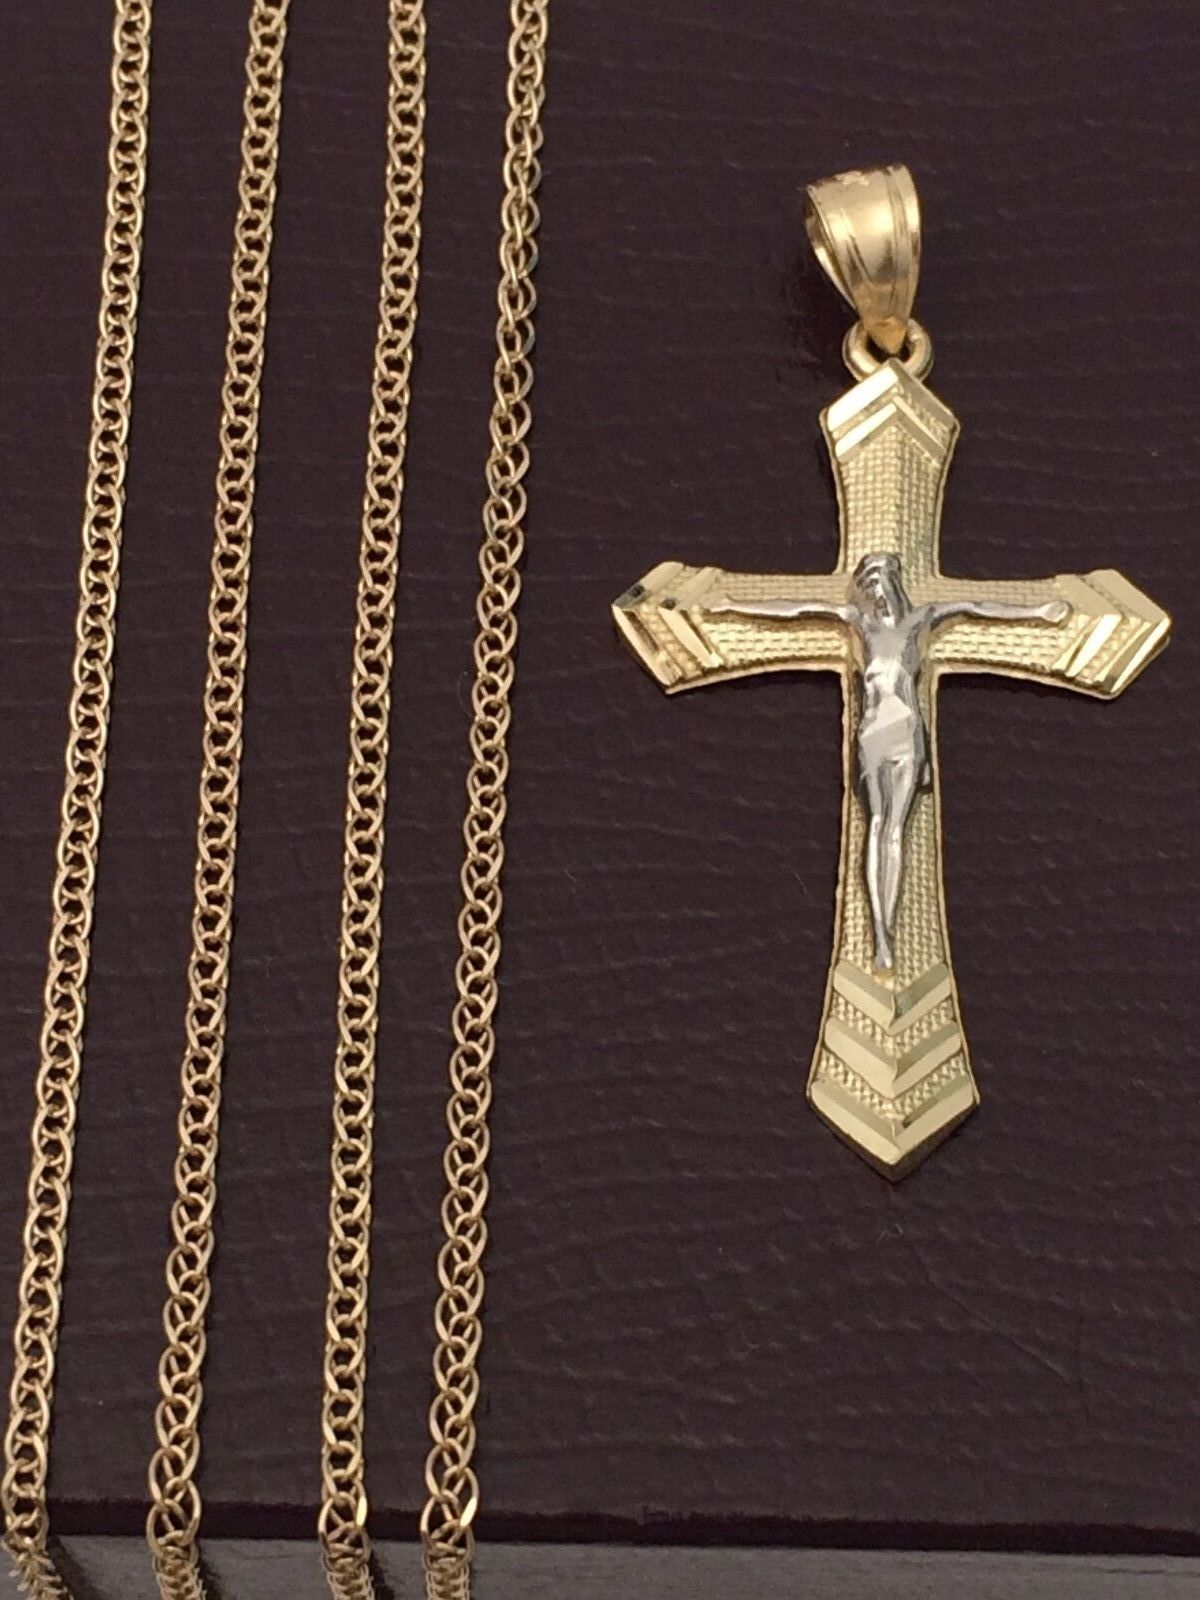 Real 10k Yellow White gold Jesus Cross Crucifix Pendant Charm gold Box chain 20